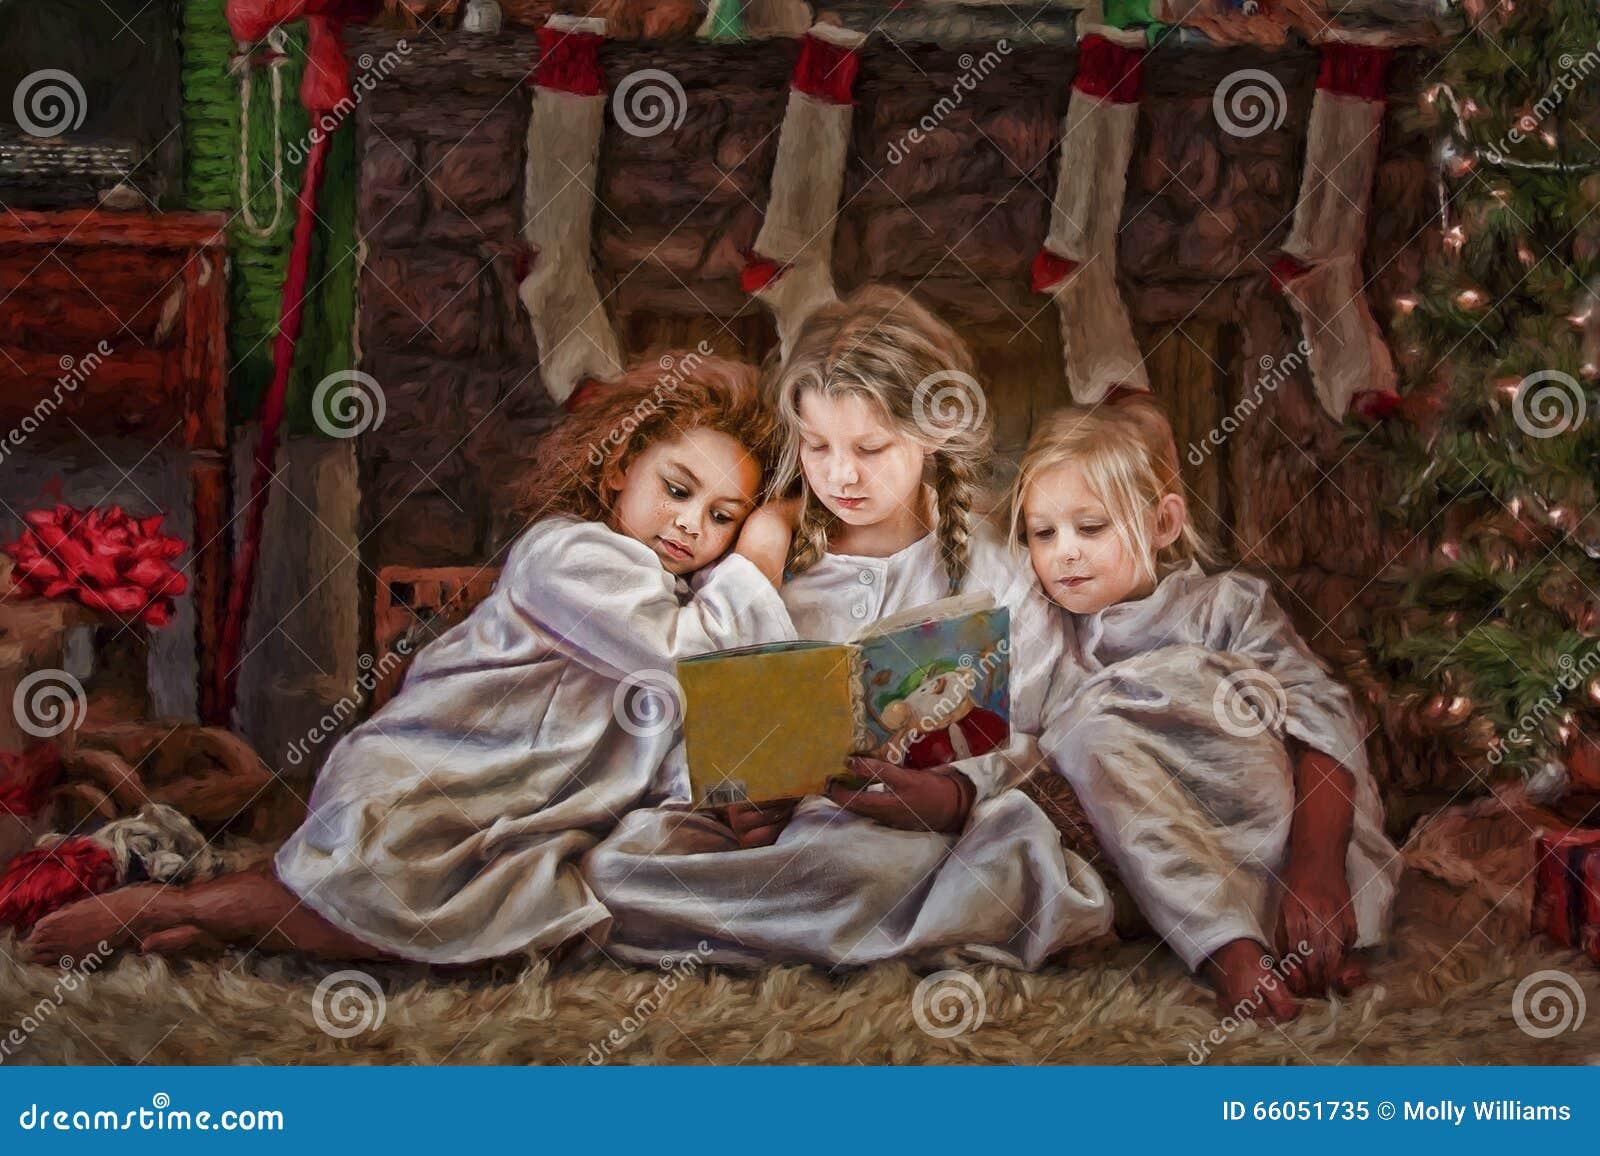 Three Girls Reading Christmas Story Book